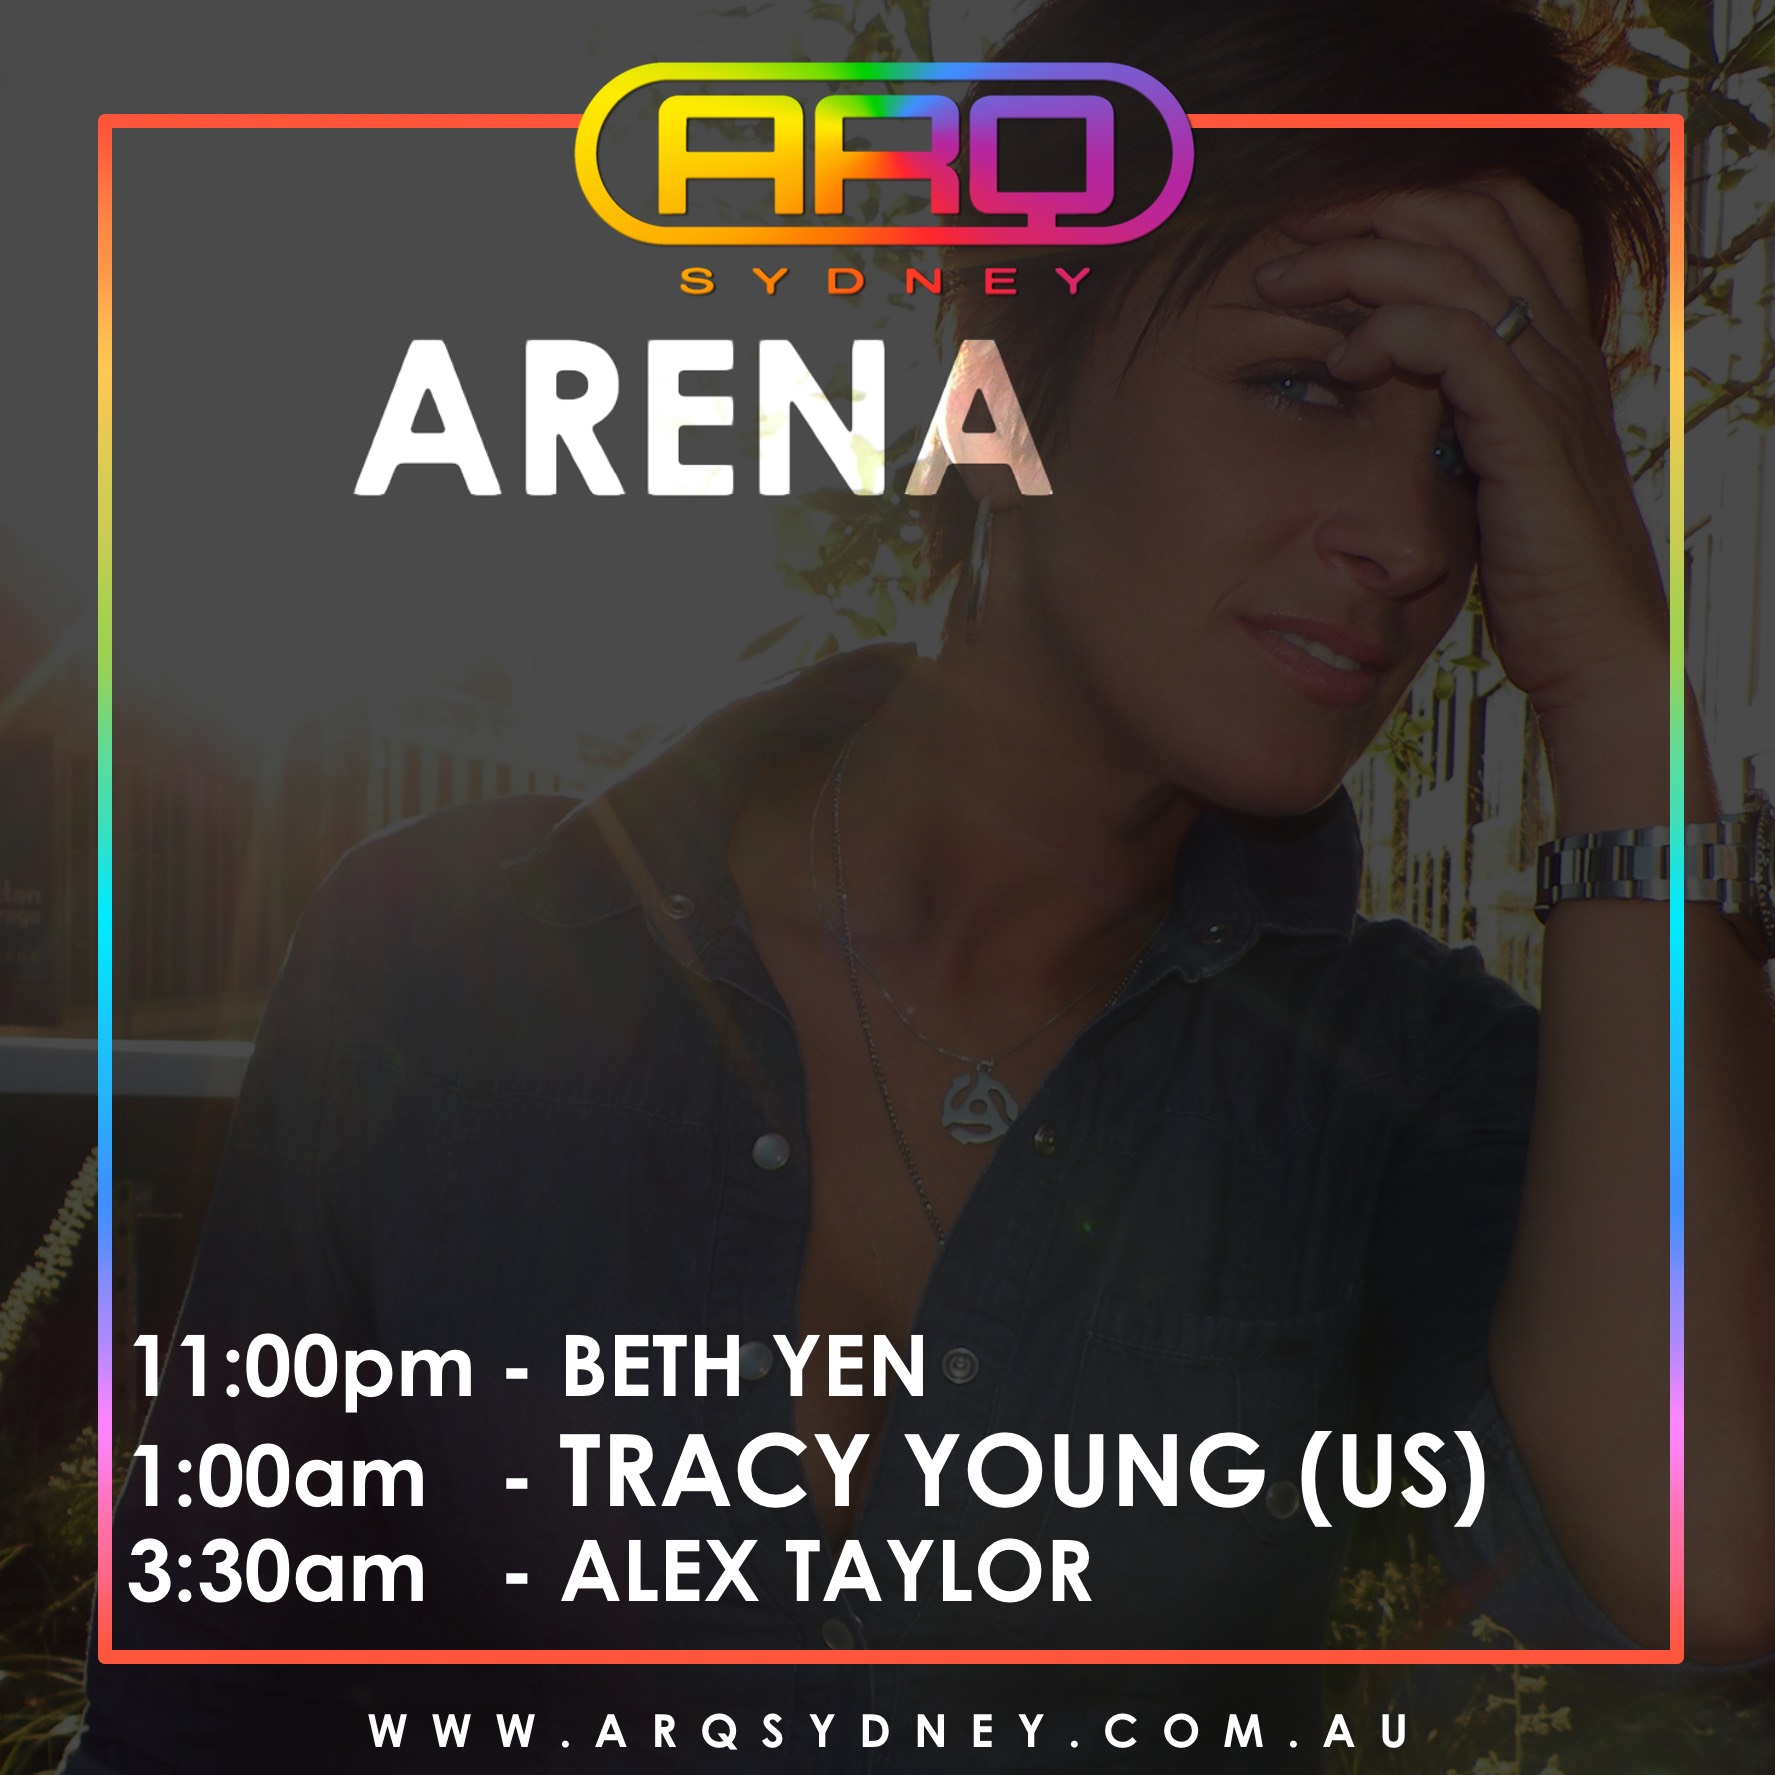 PASSPORT (Sun Mar 6th) - Arena DJ Line Up